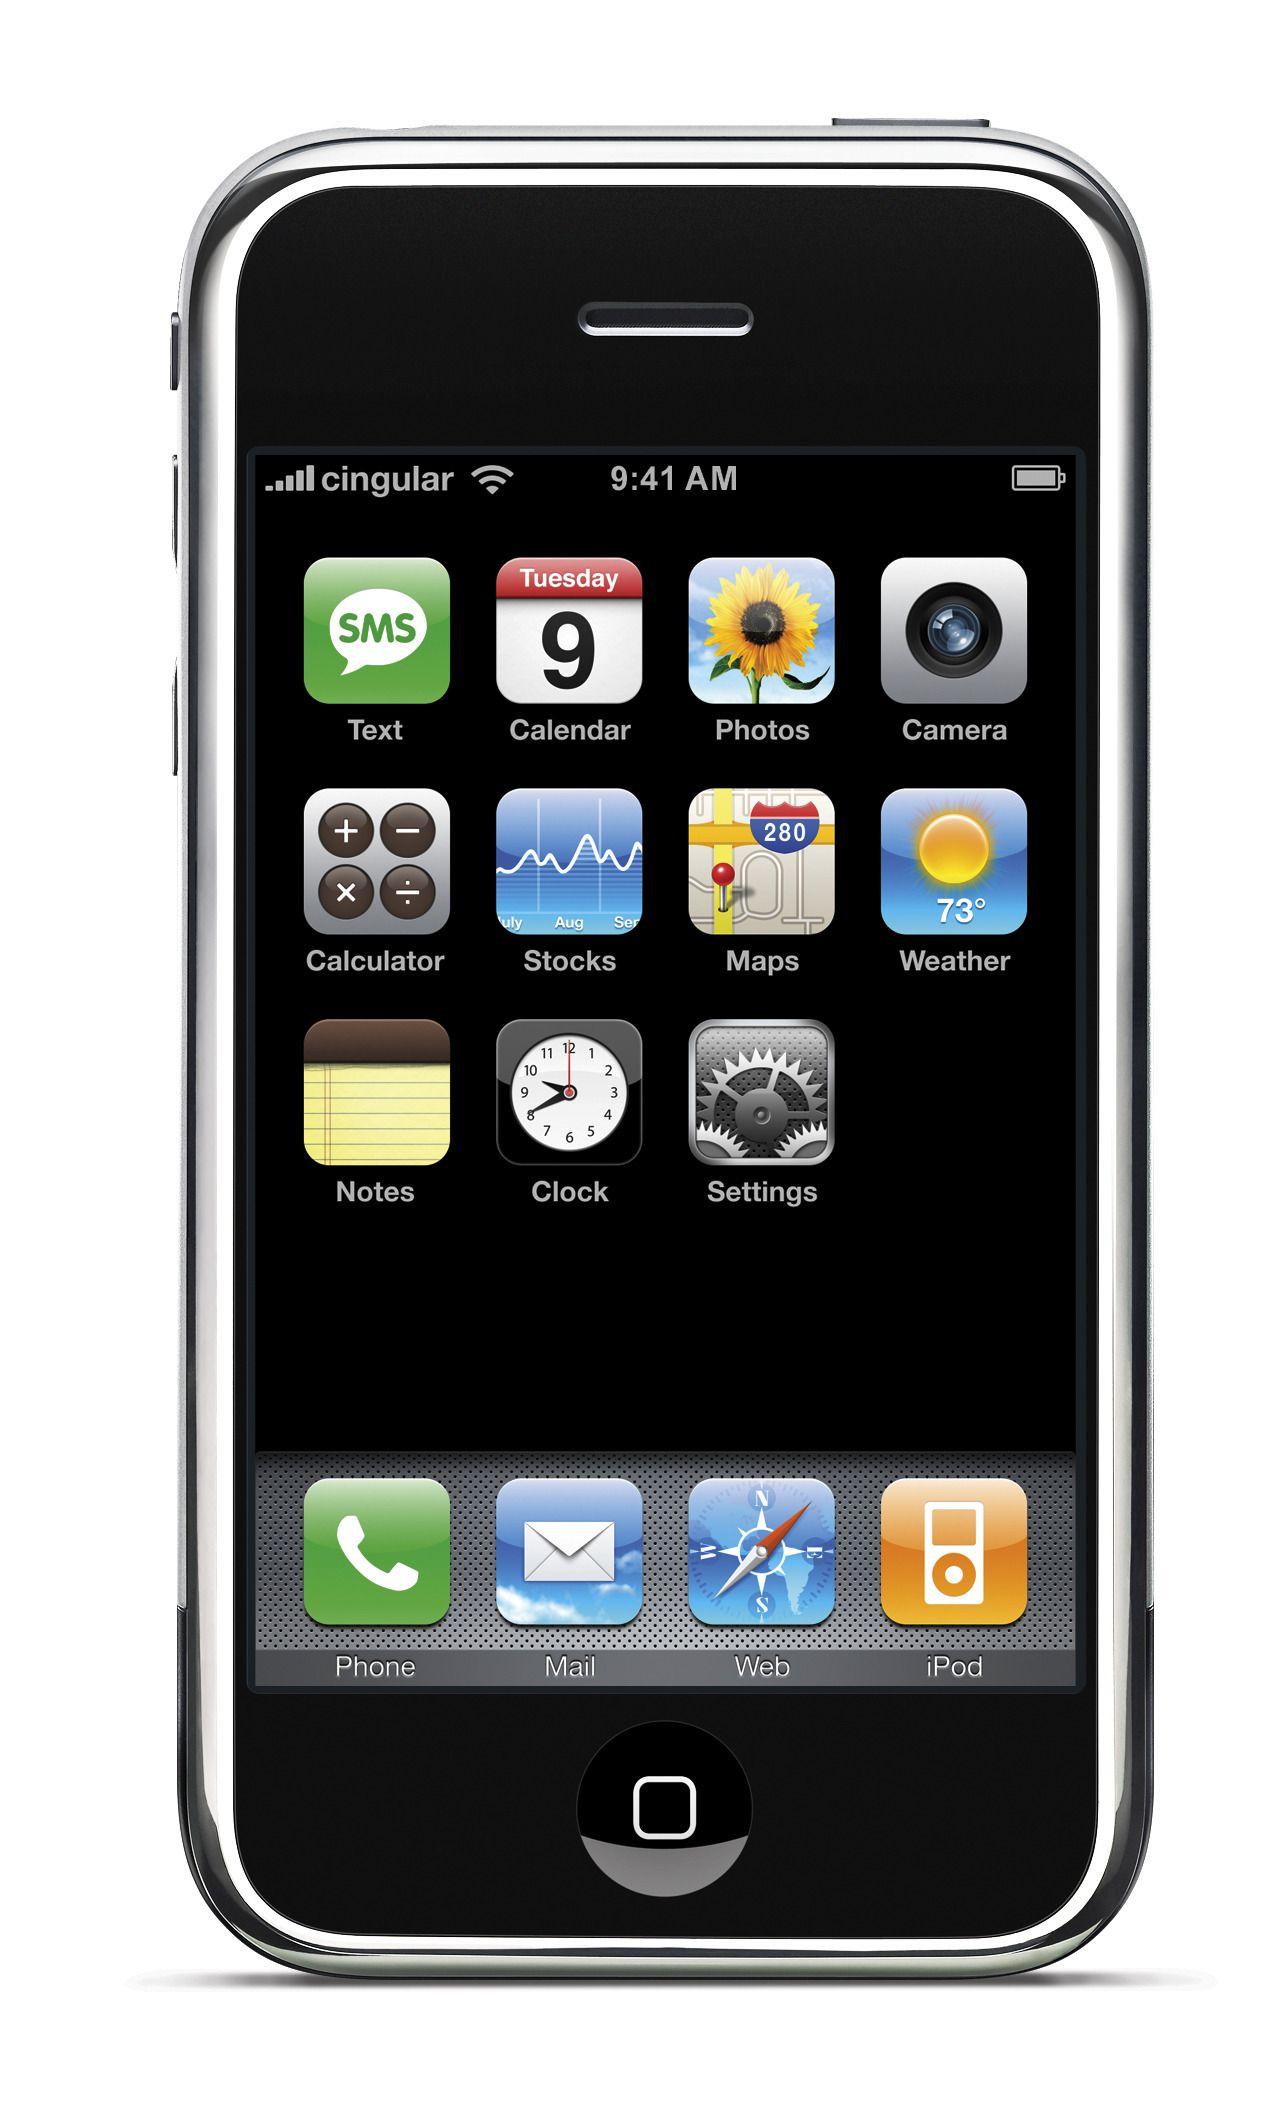 <strong>1. Original iPhone (2007)</strong>